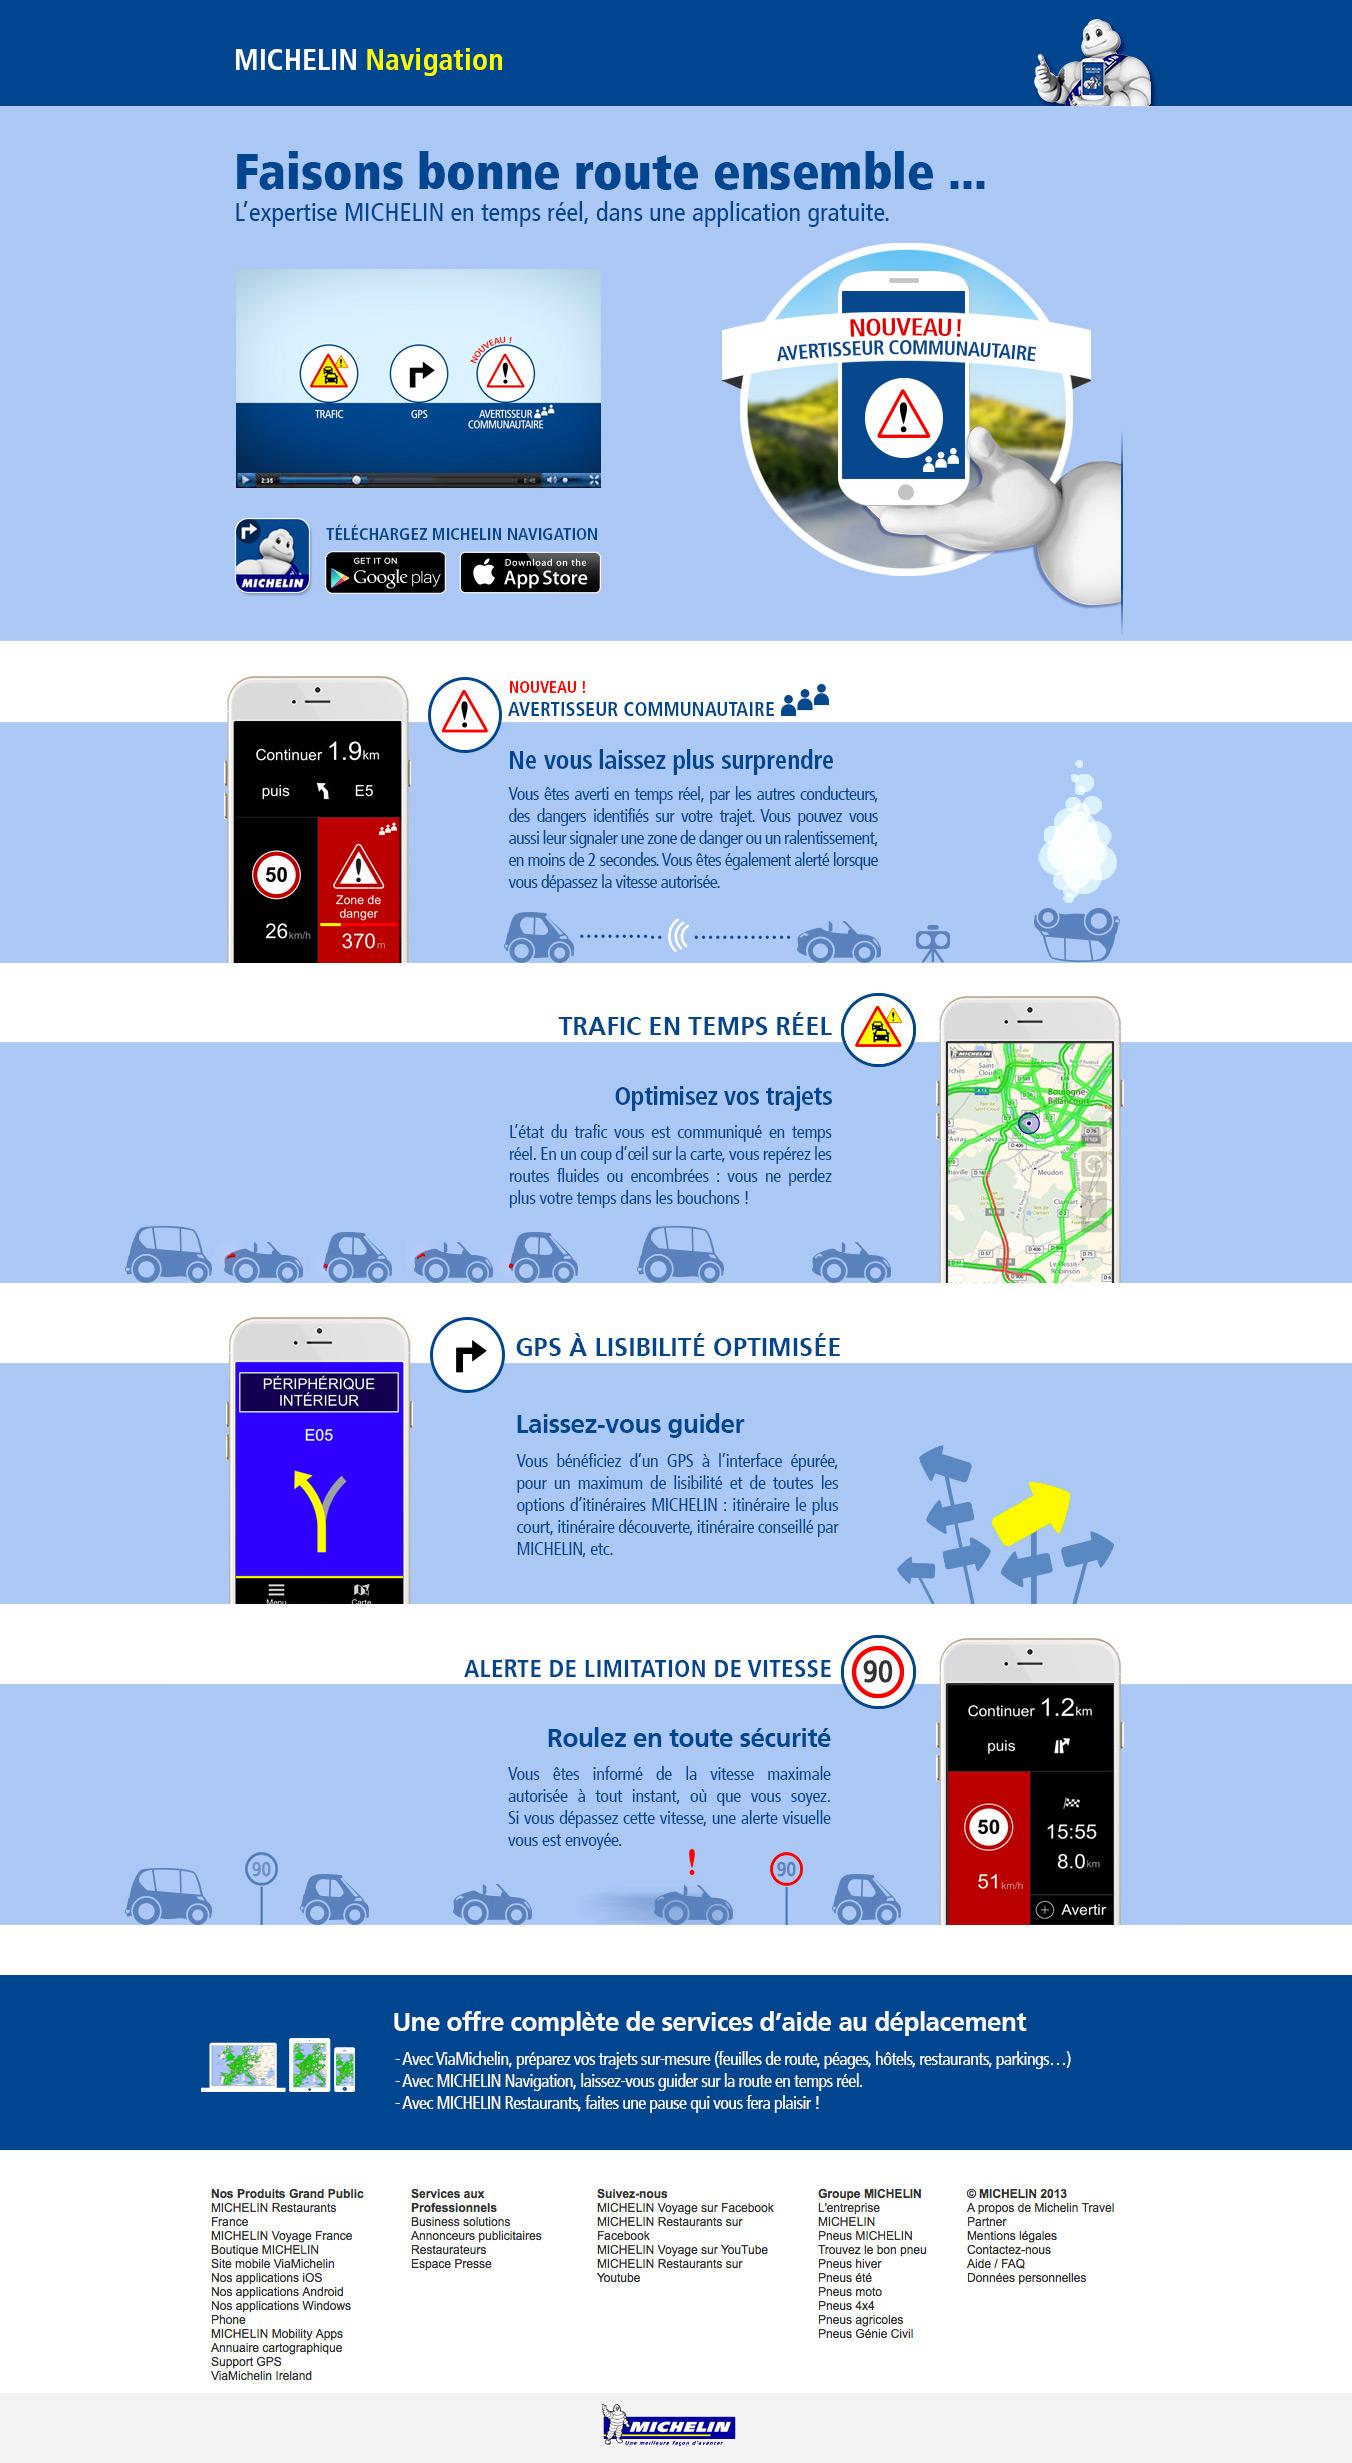 Landing page de la campagne Michelin